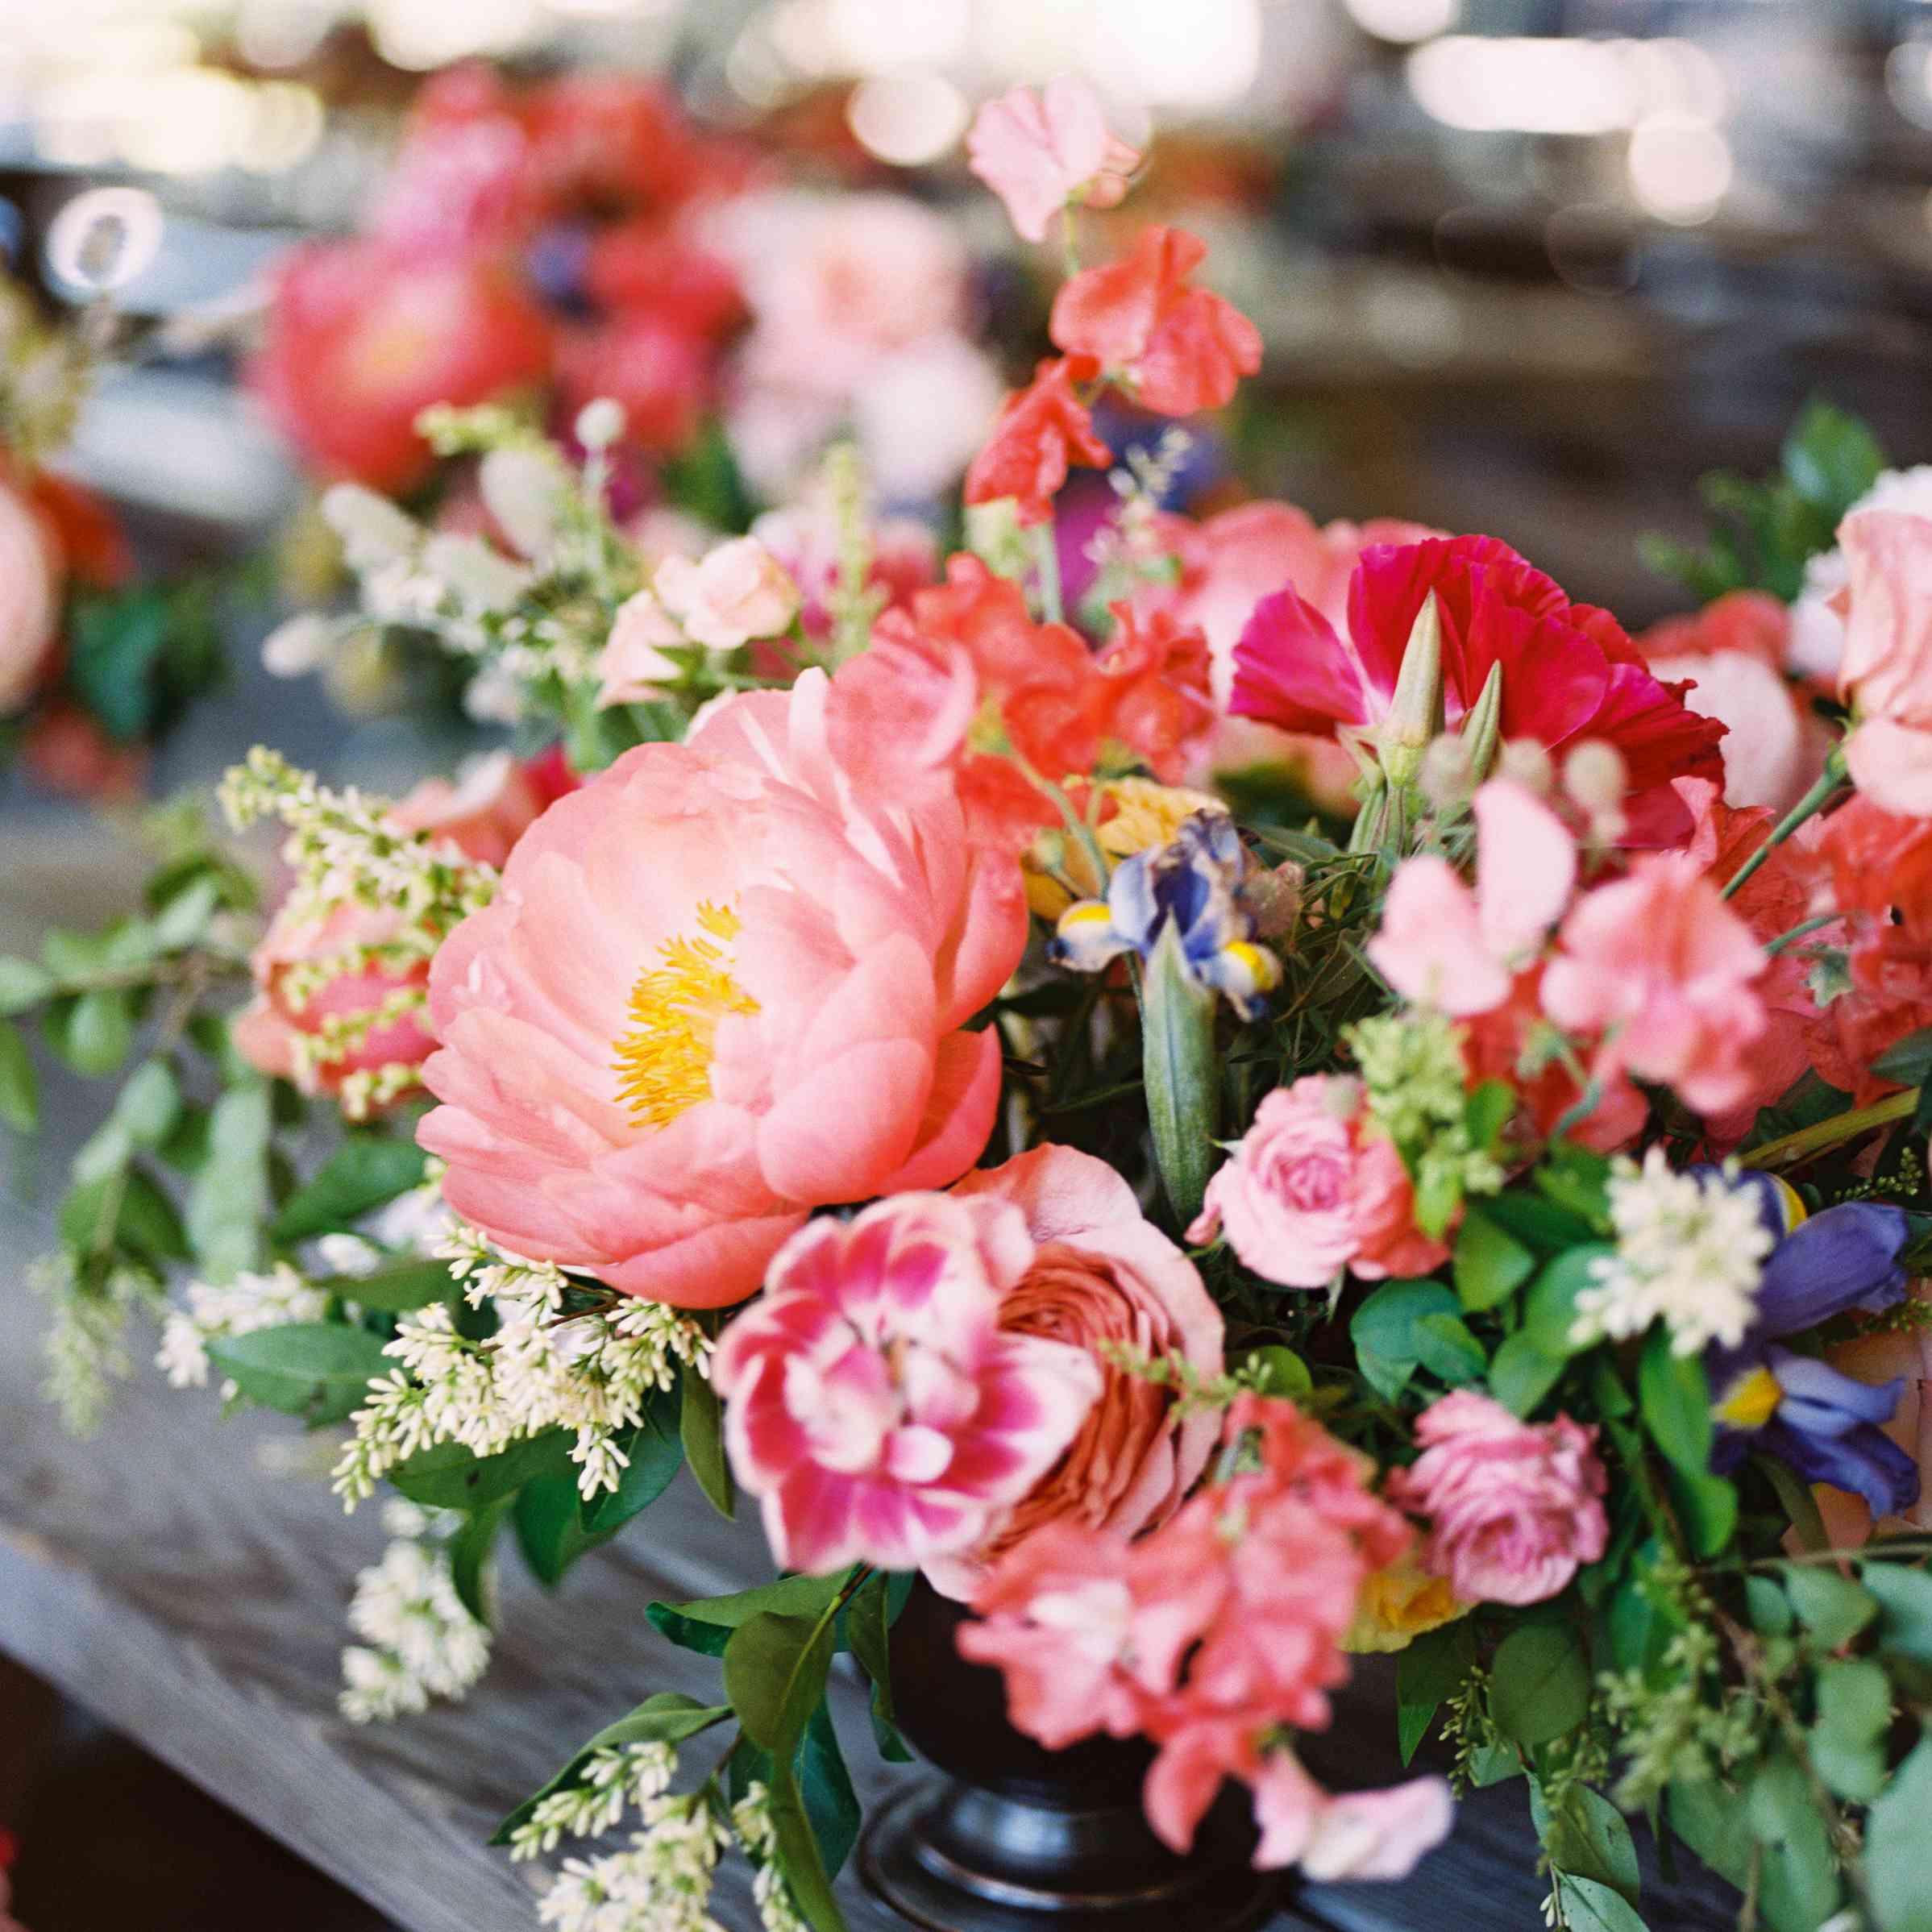 Spring Wedding Centerpiece Ideas: 11 Spring Wedding Centerpieces That'll Make You Swoon